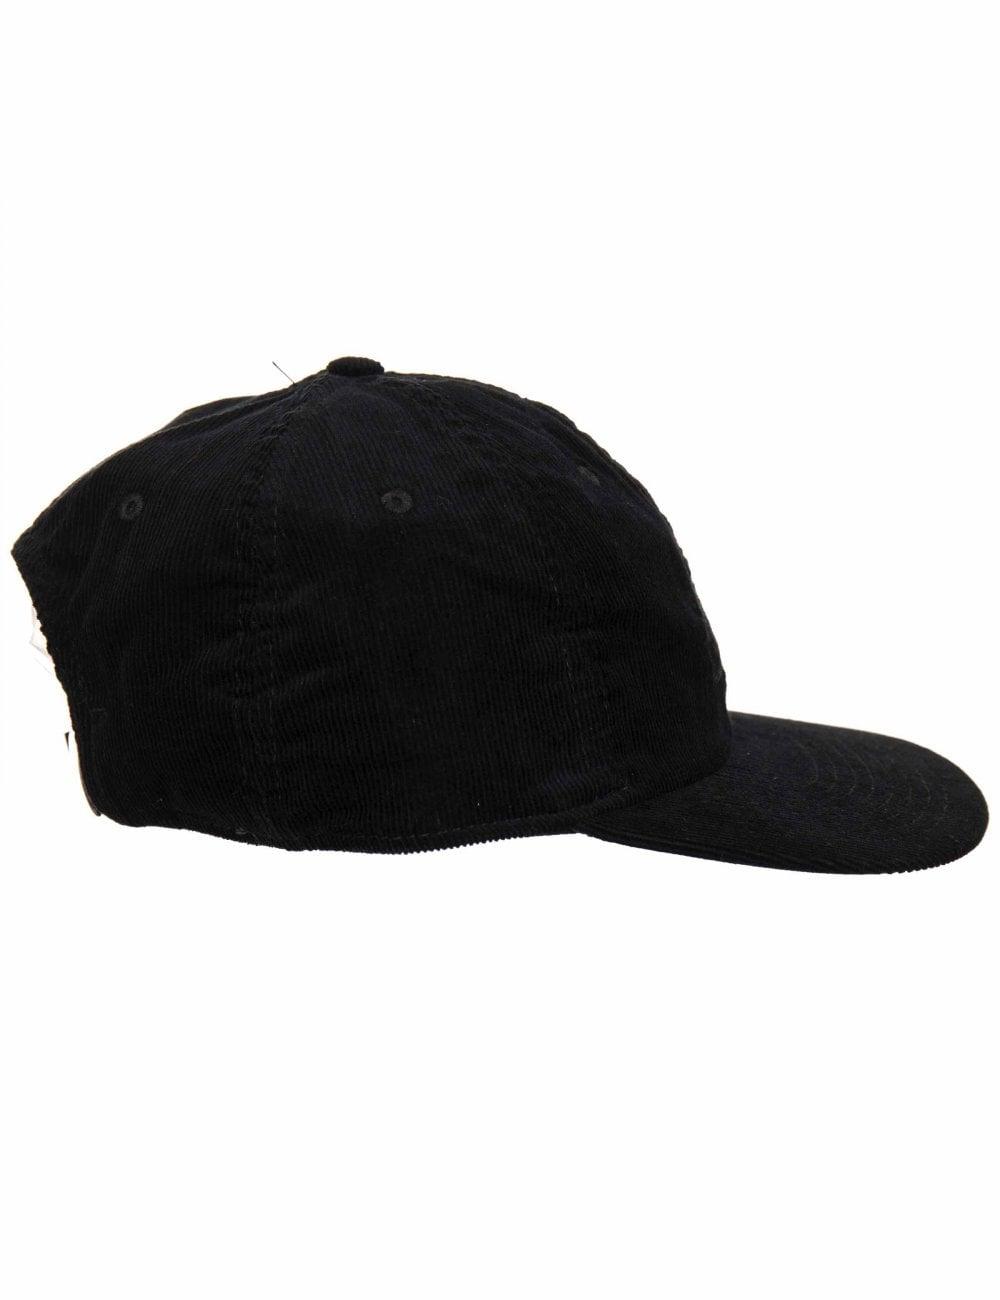 1a176d12246e1 Nike SB Heritage 86 Flatbill Cord Cap - Black Black - Hat Shop from ...